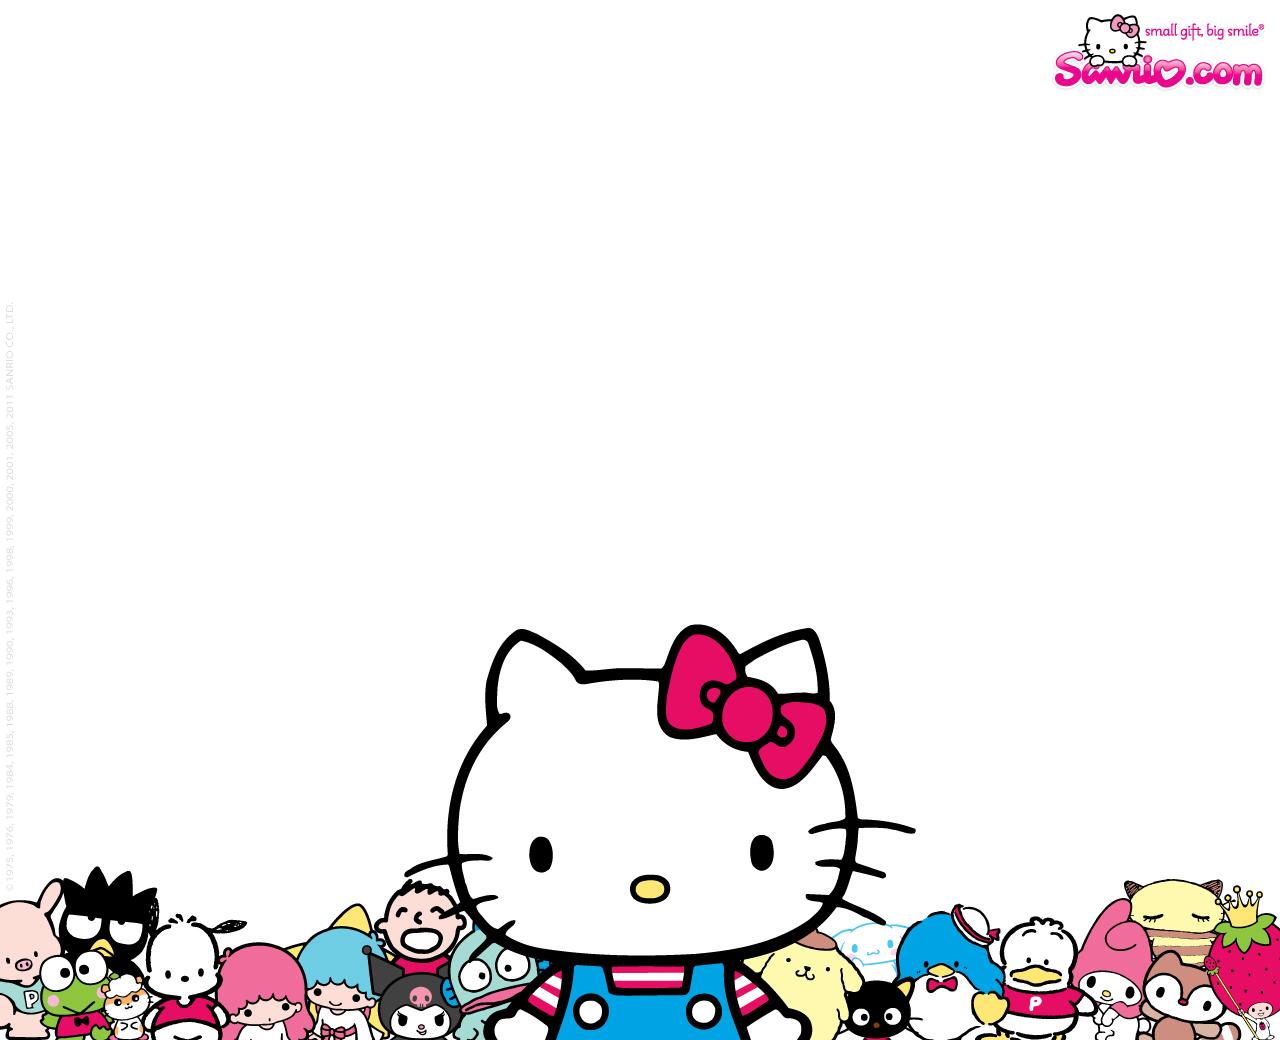 Best Ideas About Hello Kitty Wallpaper Hd On Pinterest 1280x1040